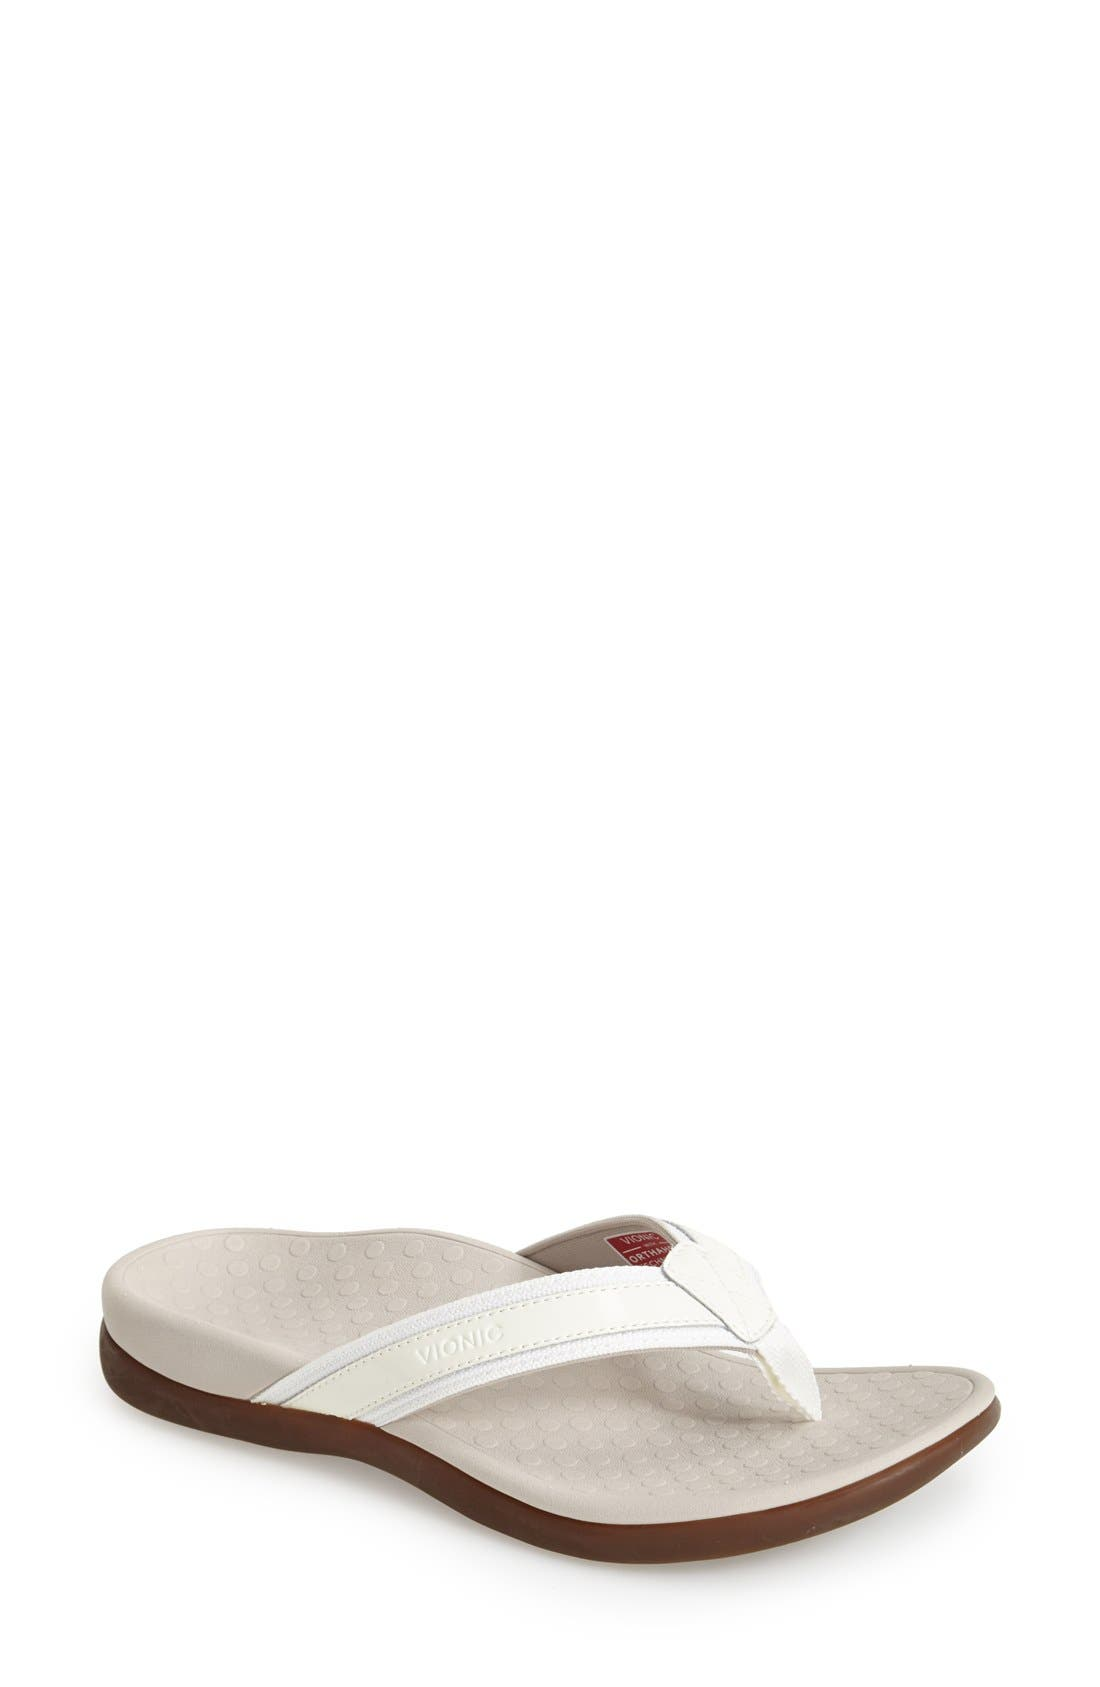 'Tide II' Flip Flop,                         Main,                         color, White